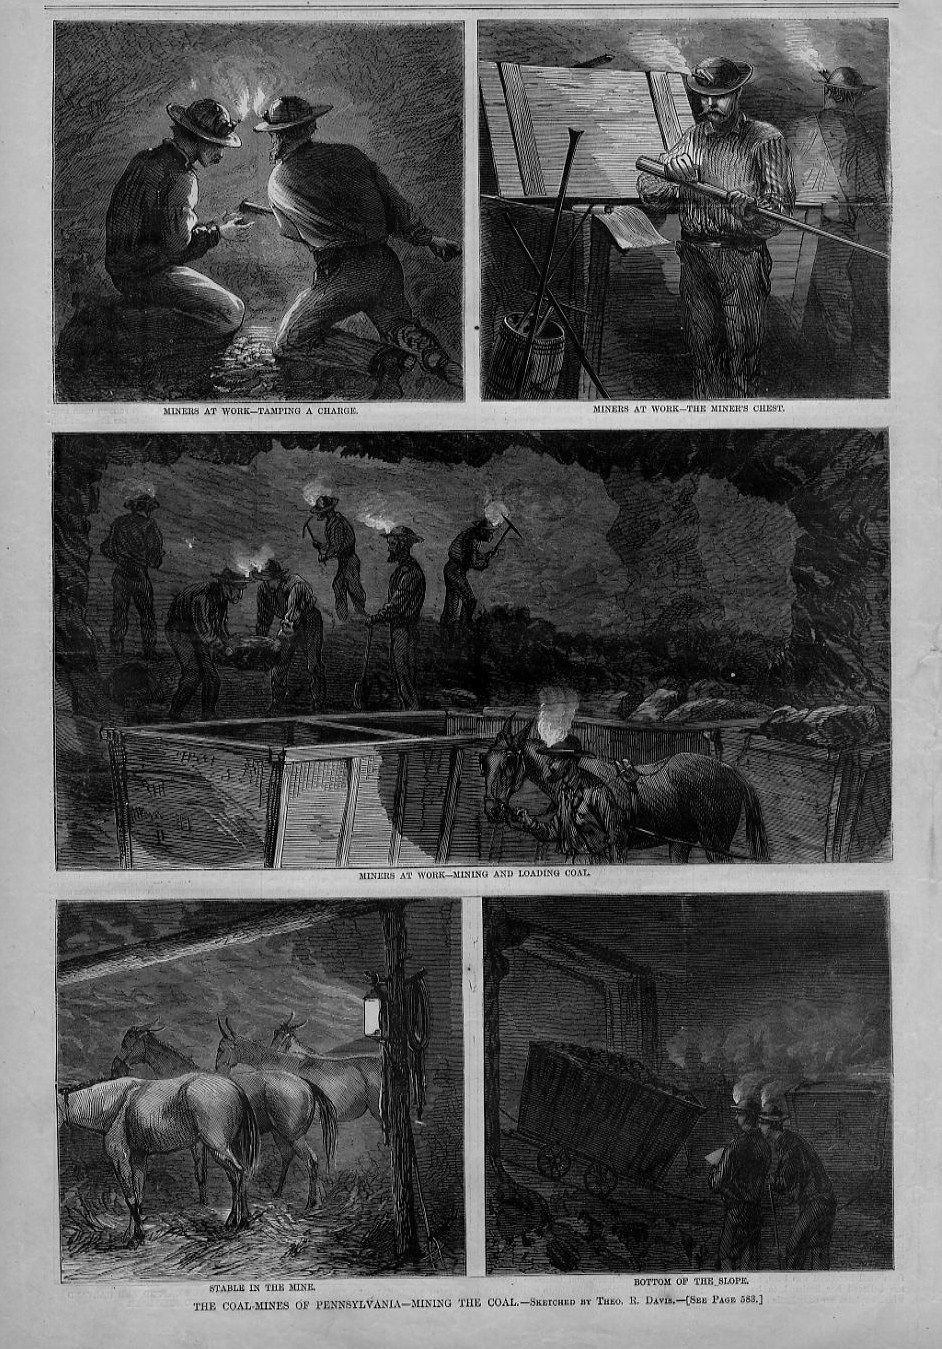 COAL MINES OF PENNSYLVANIA HISTORY MINERS AT WORK MULE LANTERN CANDLE HEADLAMP